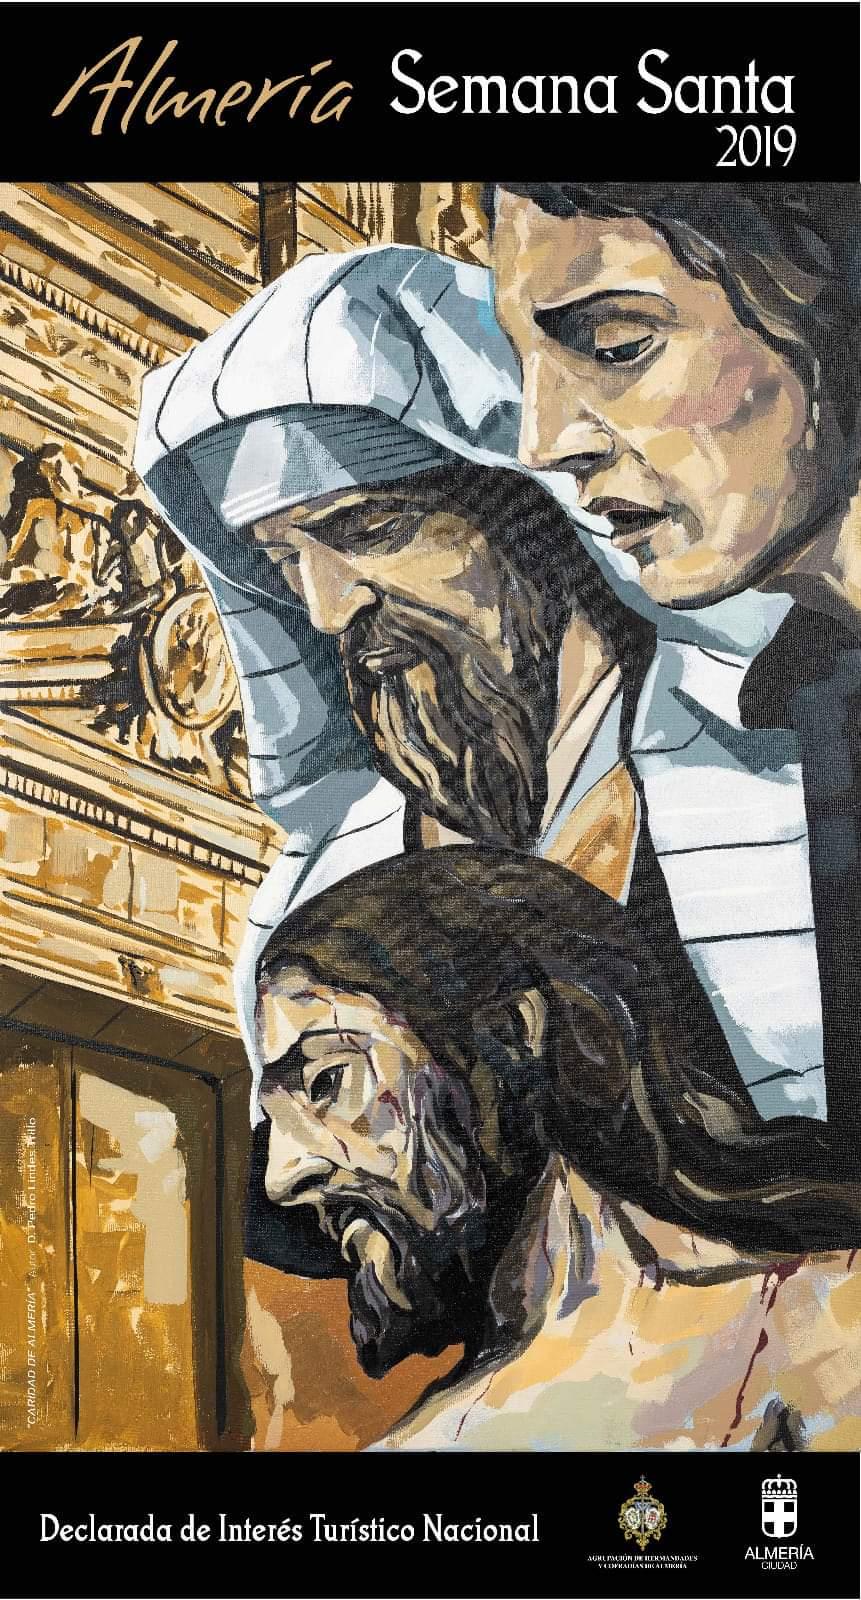 Cartel Semana Santa Almeria 2019